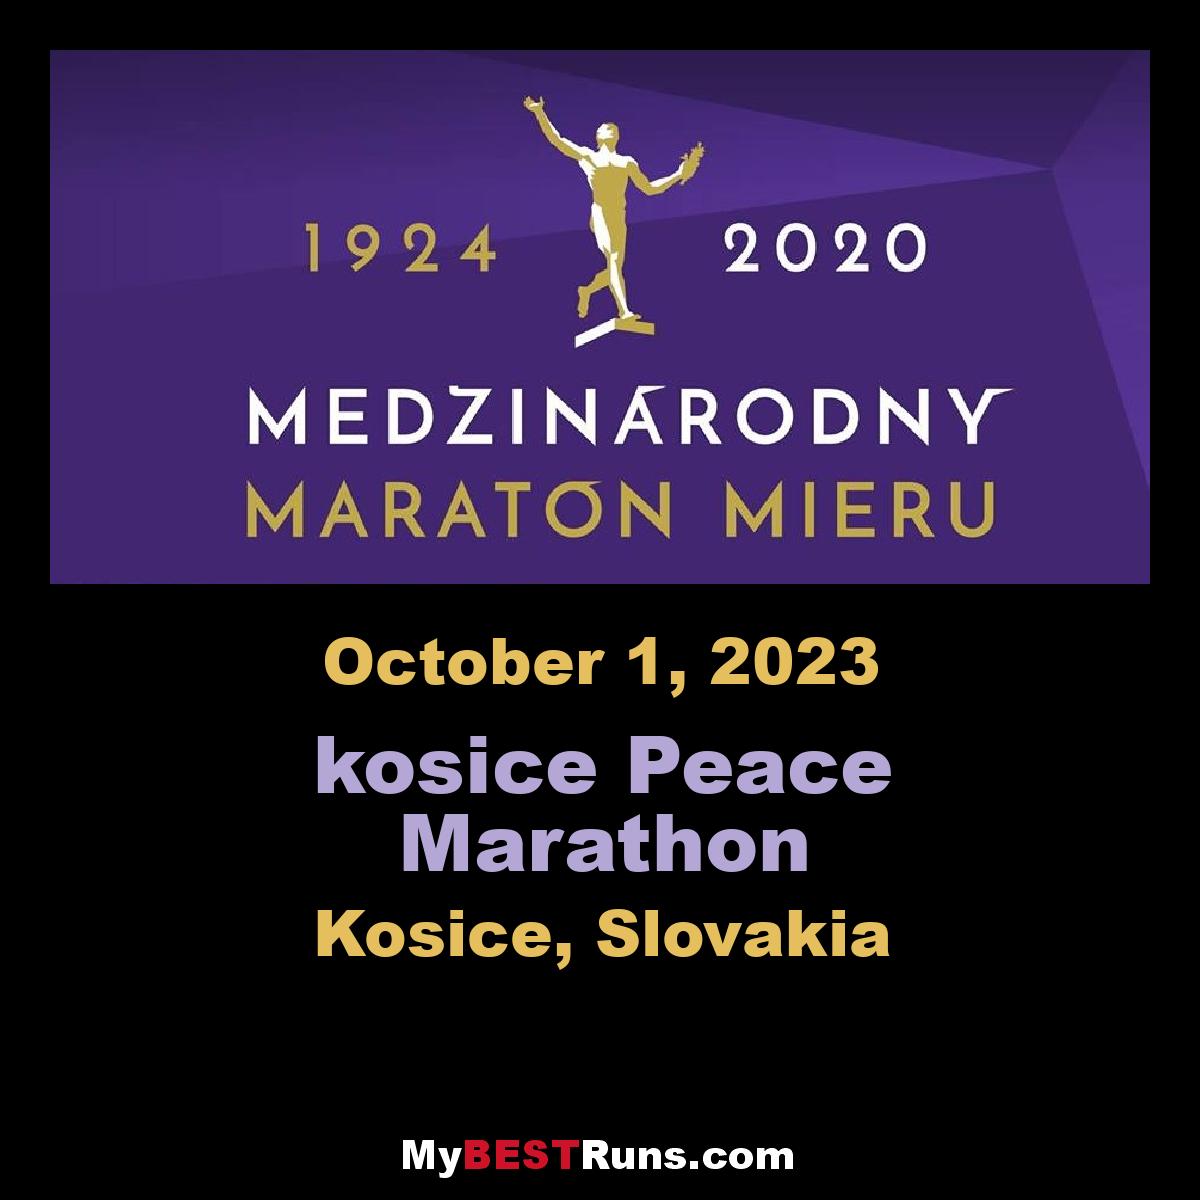 kosice Peace Marathon